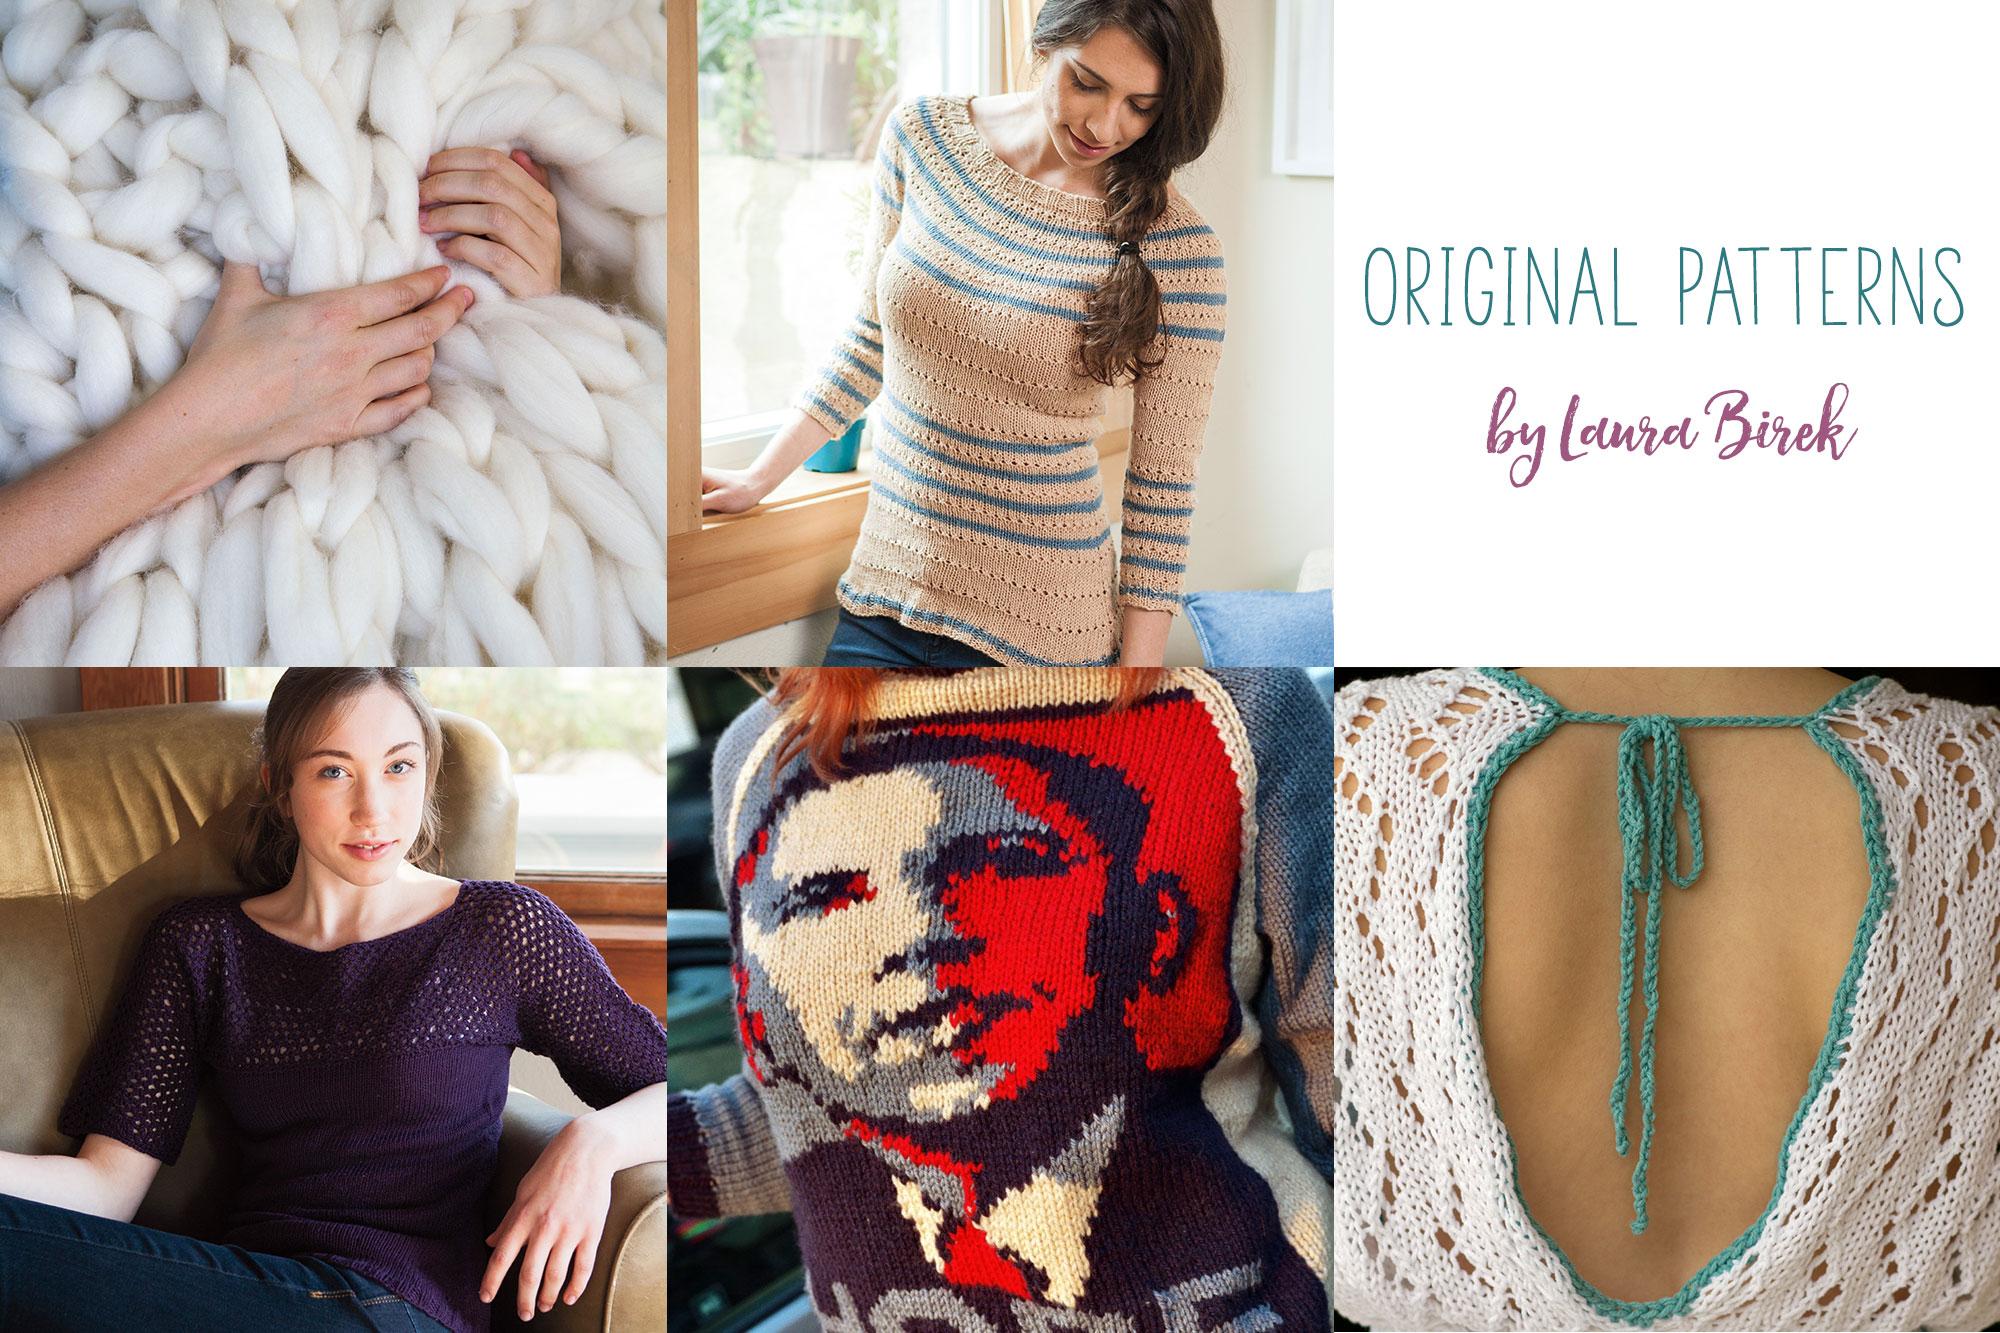 Original Knitting Patterns by Laura Birek